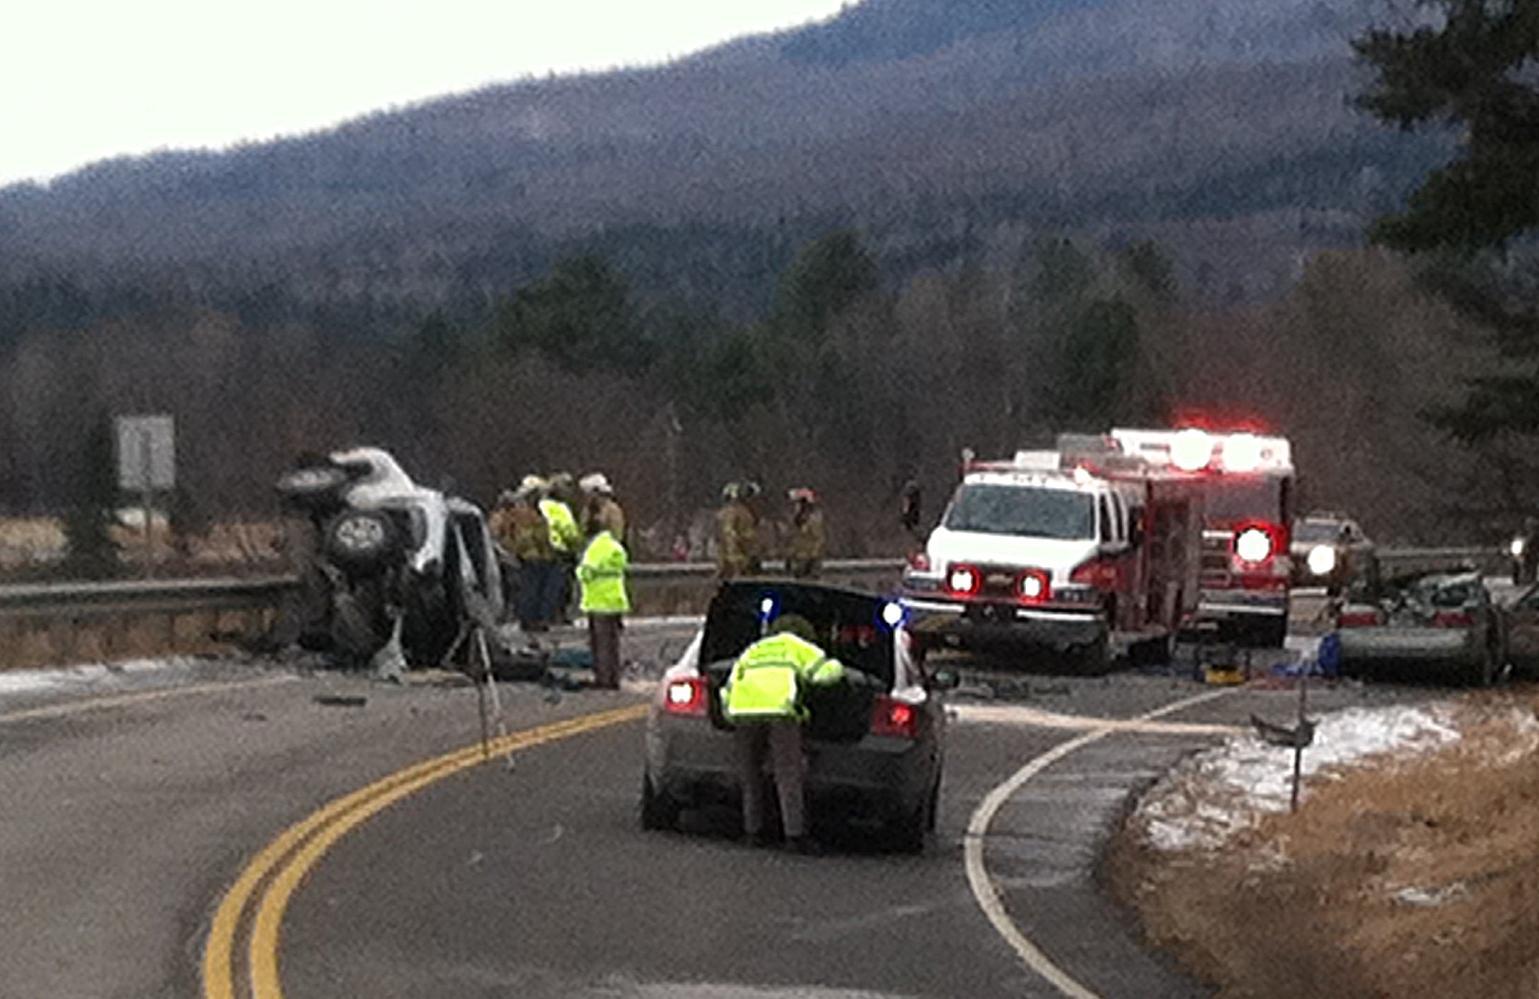 Crossover Crash Kills One In Columbia | New Hampshire Public